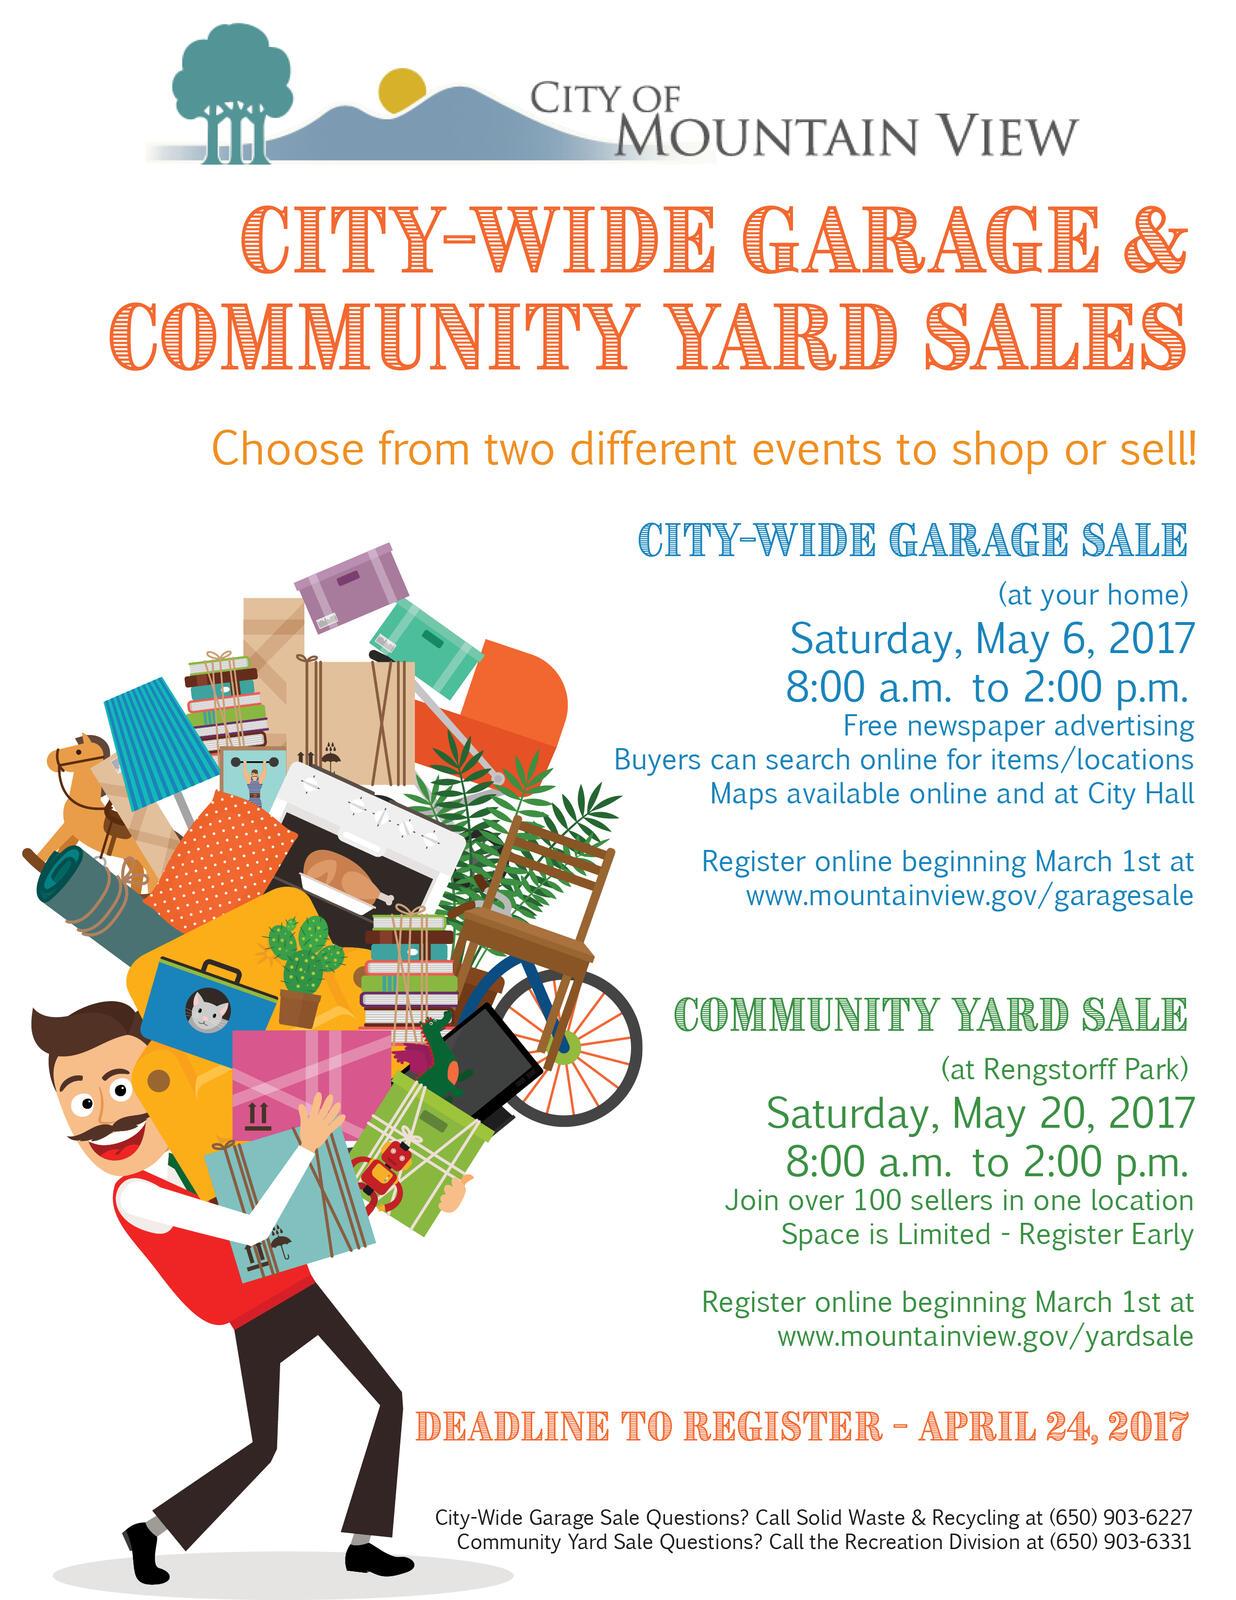 city wide garage sale community yard sale registration begins